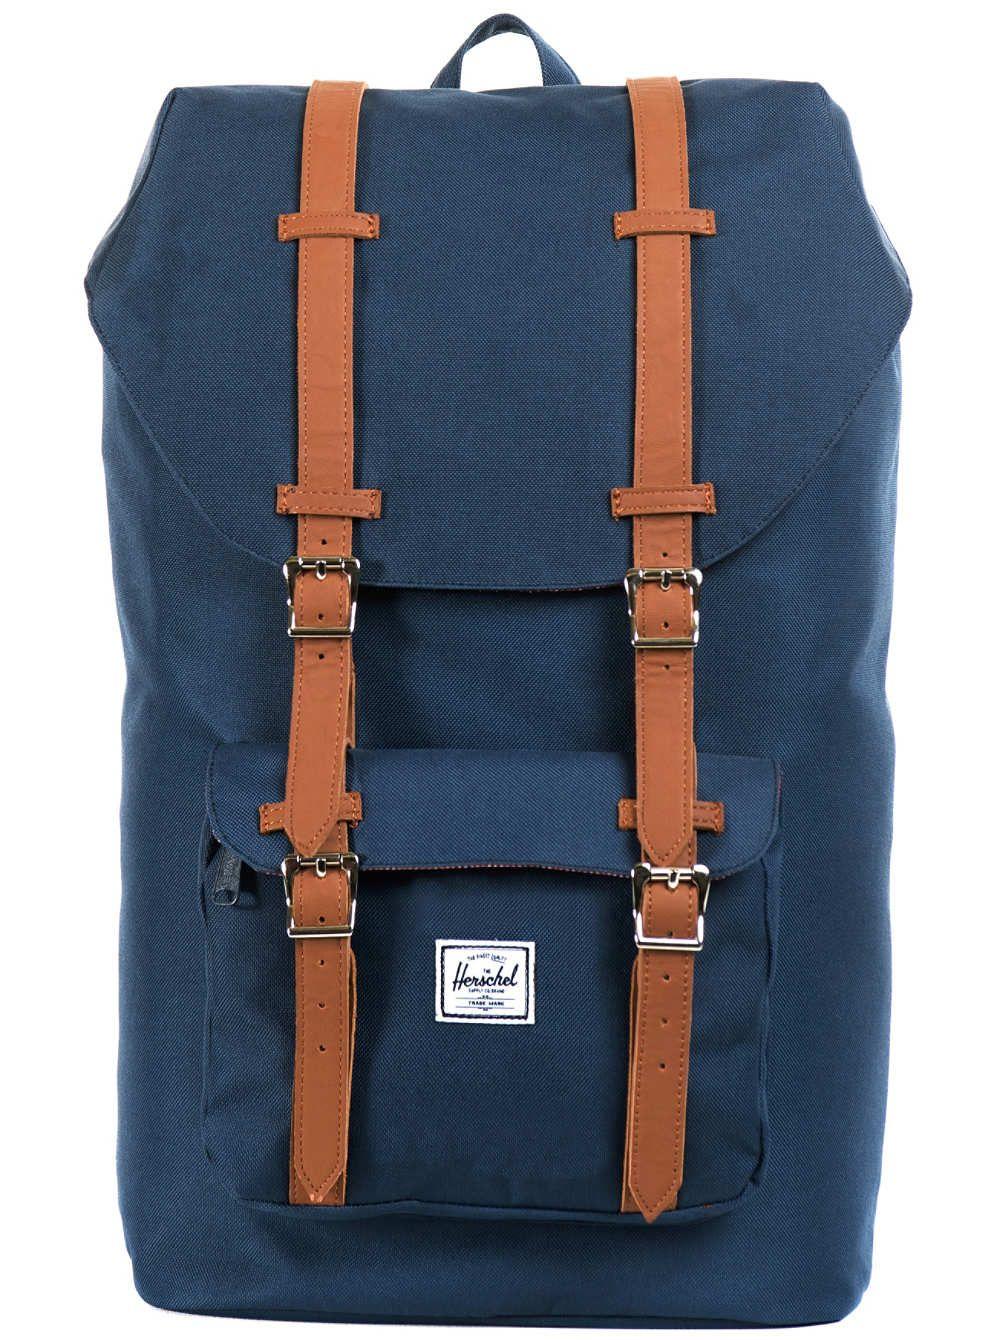 Osta Herschel Little America Backpack verkosta blue-tomato.com